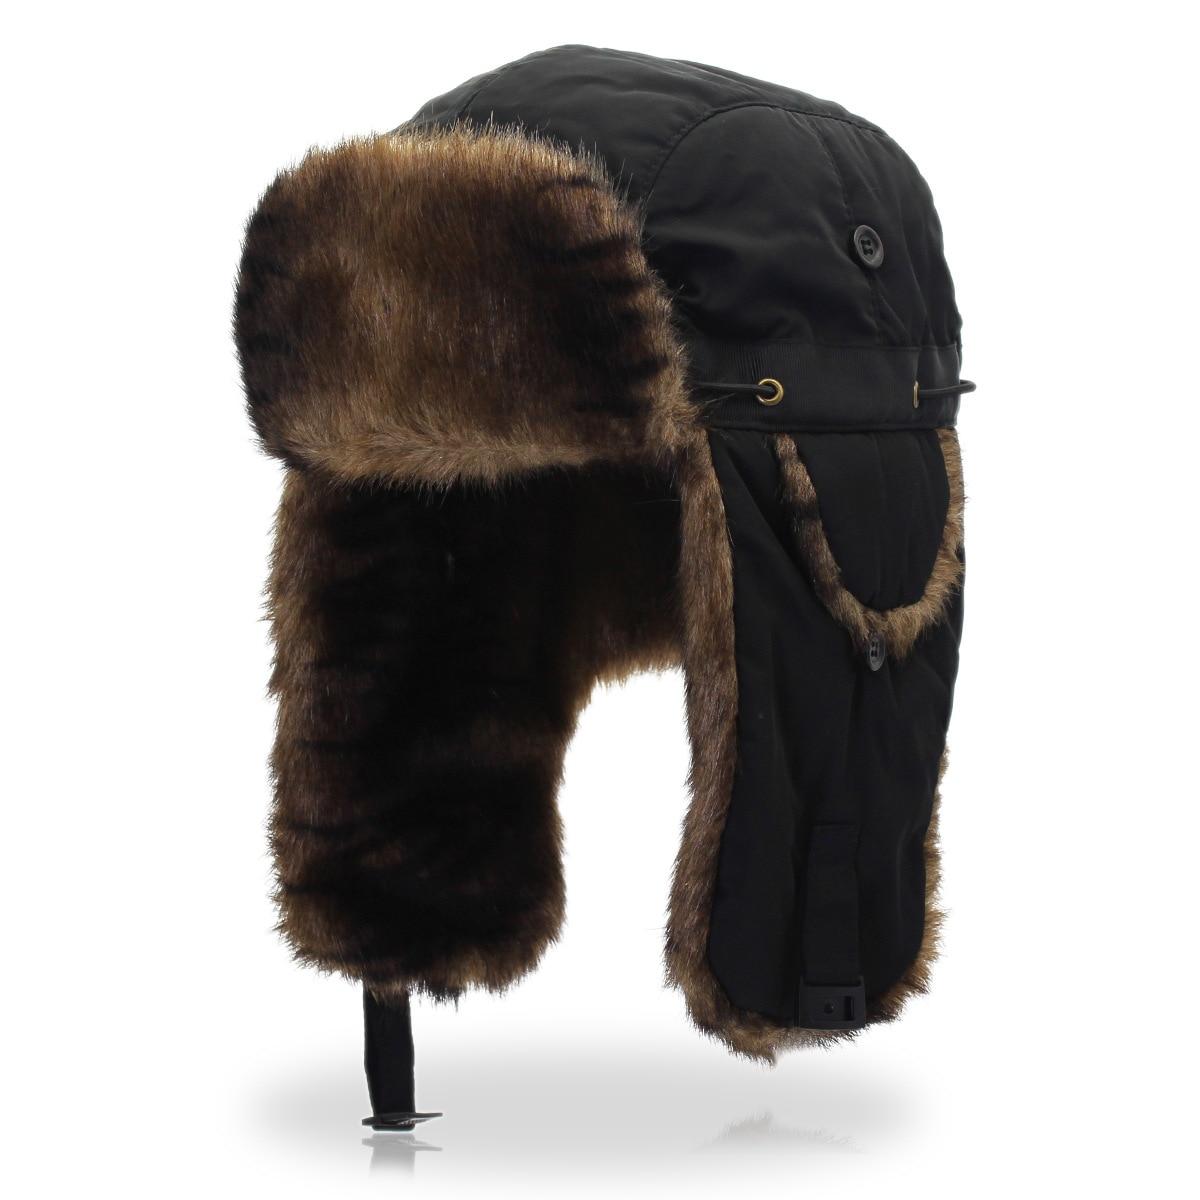 a1e0b3d80 US $16.43 35% OFF|BUTTERMERE Russian Ushanka Soviet Hats Black Bombers Hat  Fur Mens Winter Hats Ear Flaps Winter Outdoor Pilot Hat For Men Women-in ...